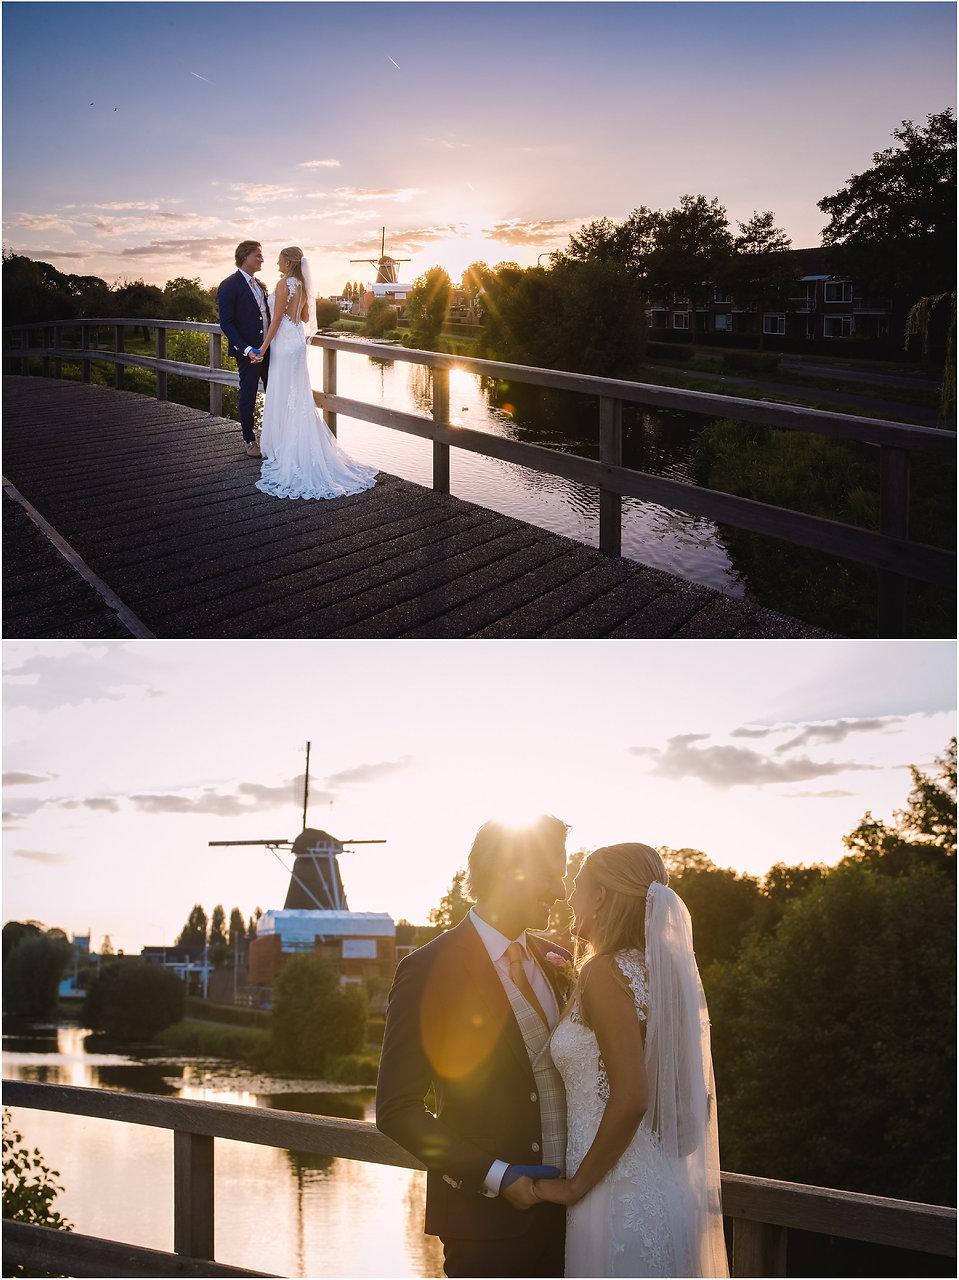 Arjen en Elise golden hour_0002.jpg